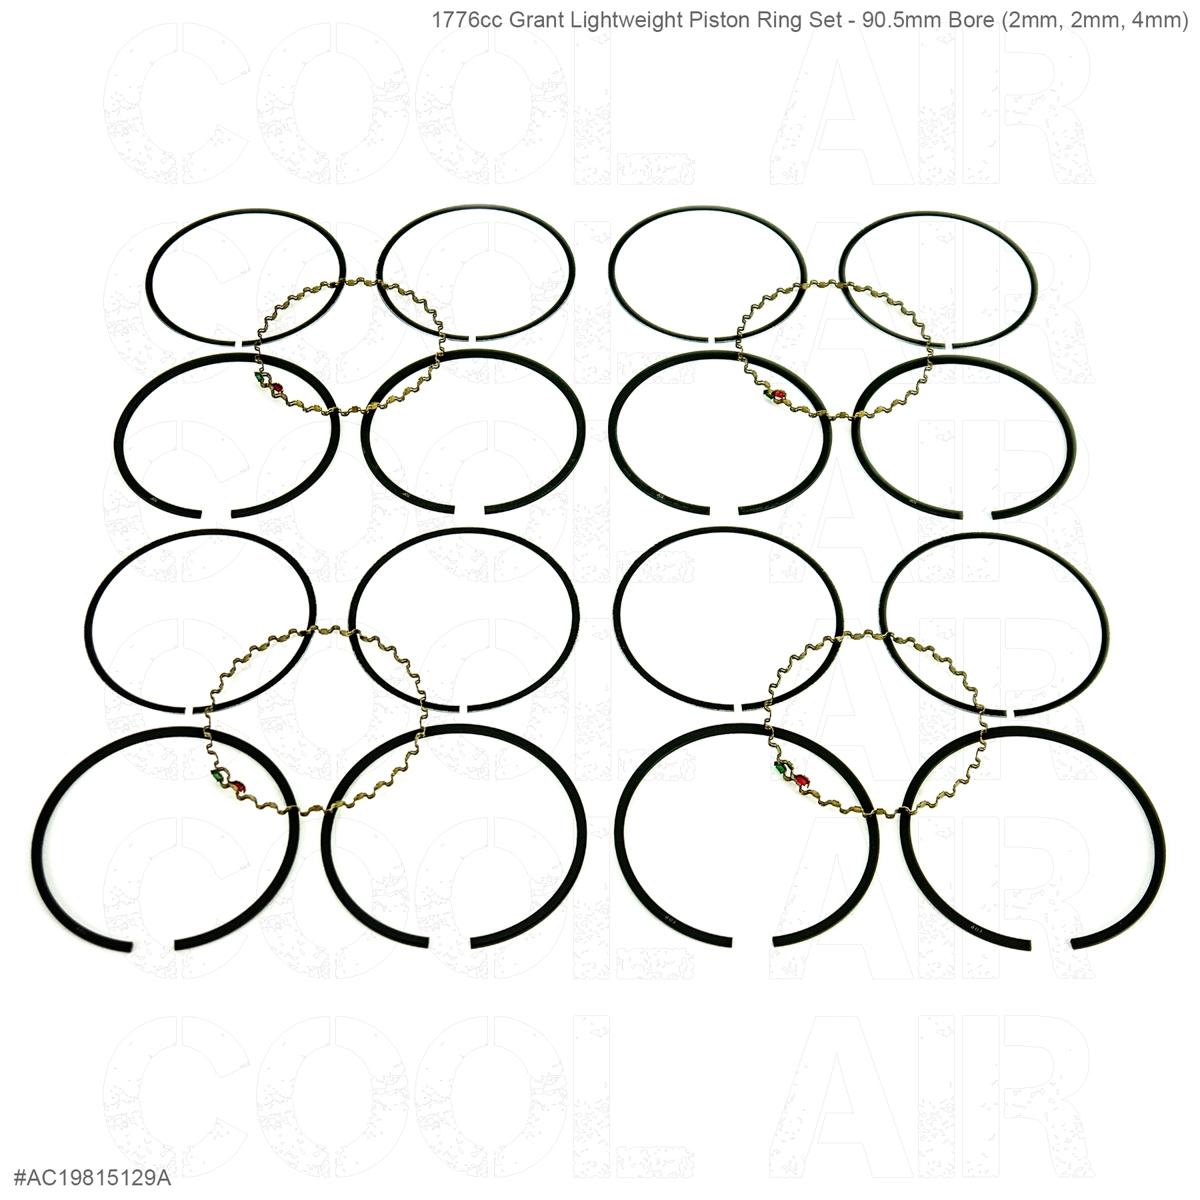 1776cc Grant Lightweight Piston Ring Set - 90.5mm Bore (2mm, 2mm, 4mm)